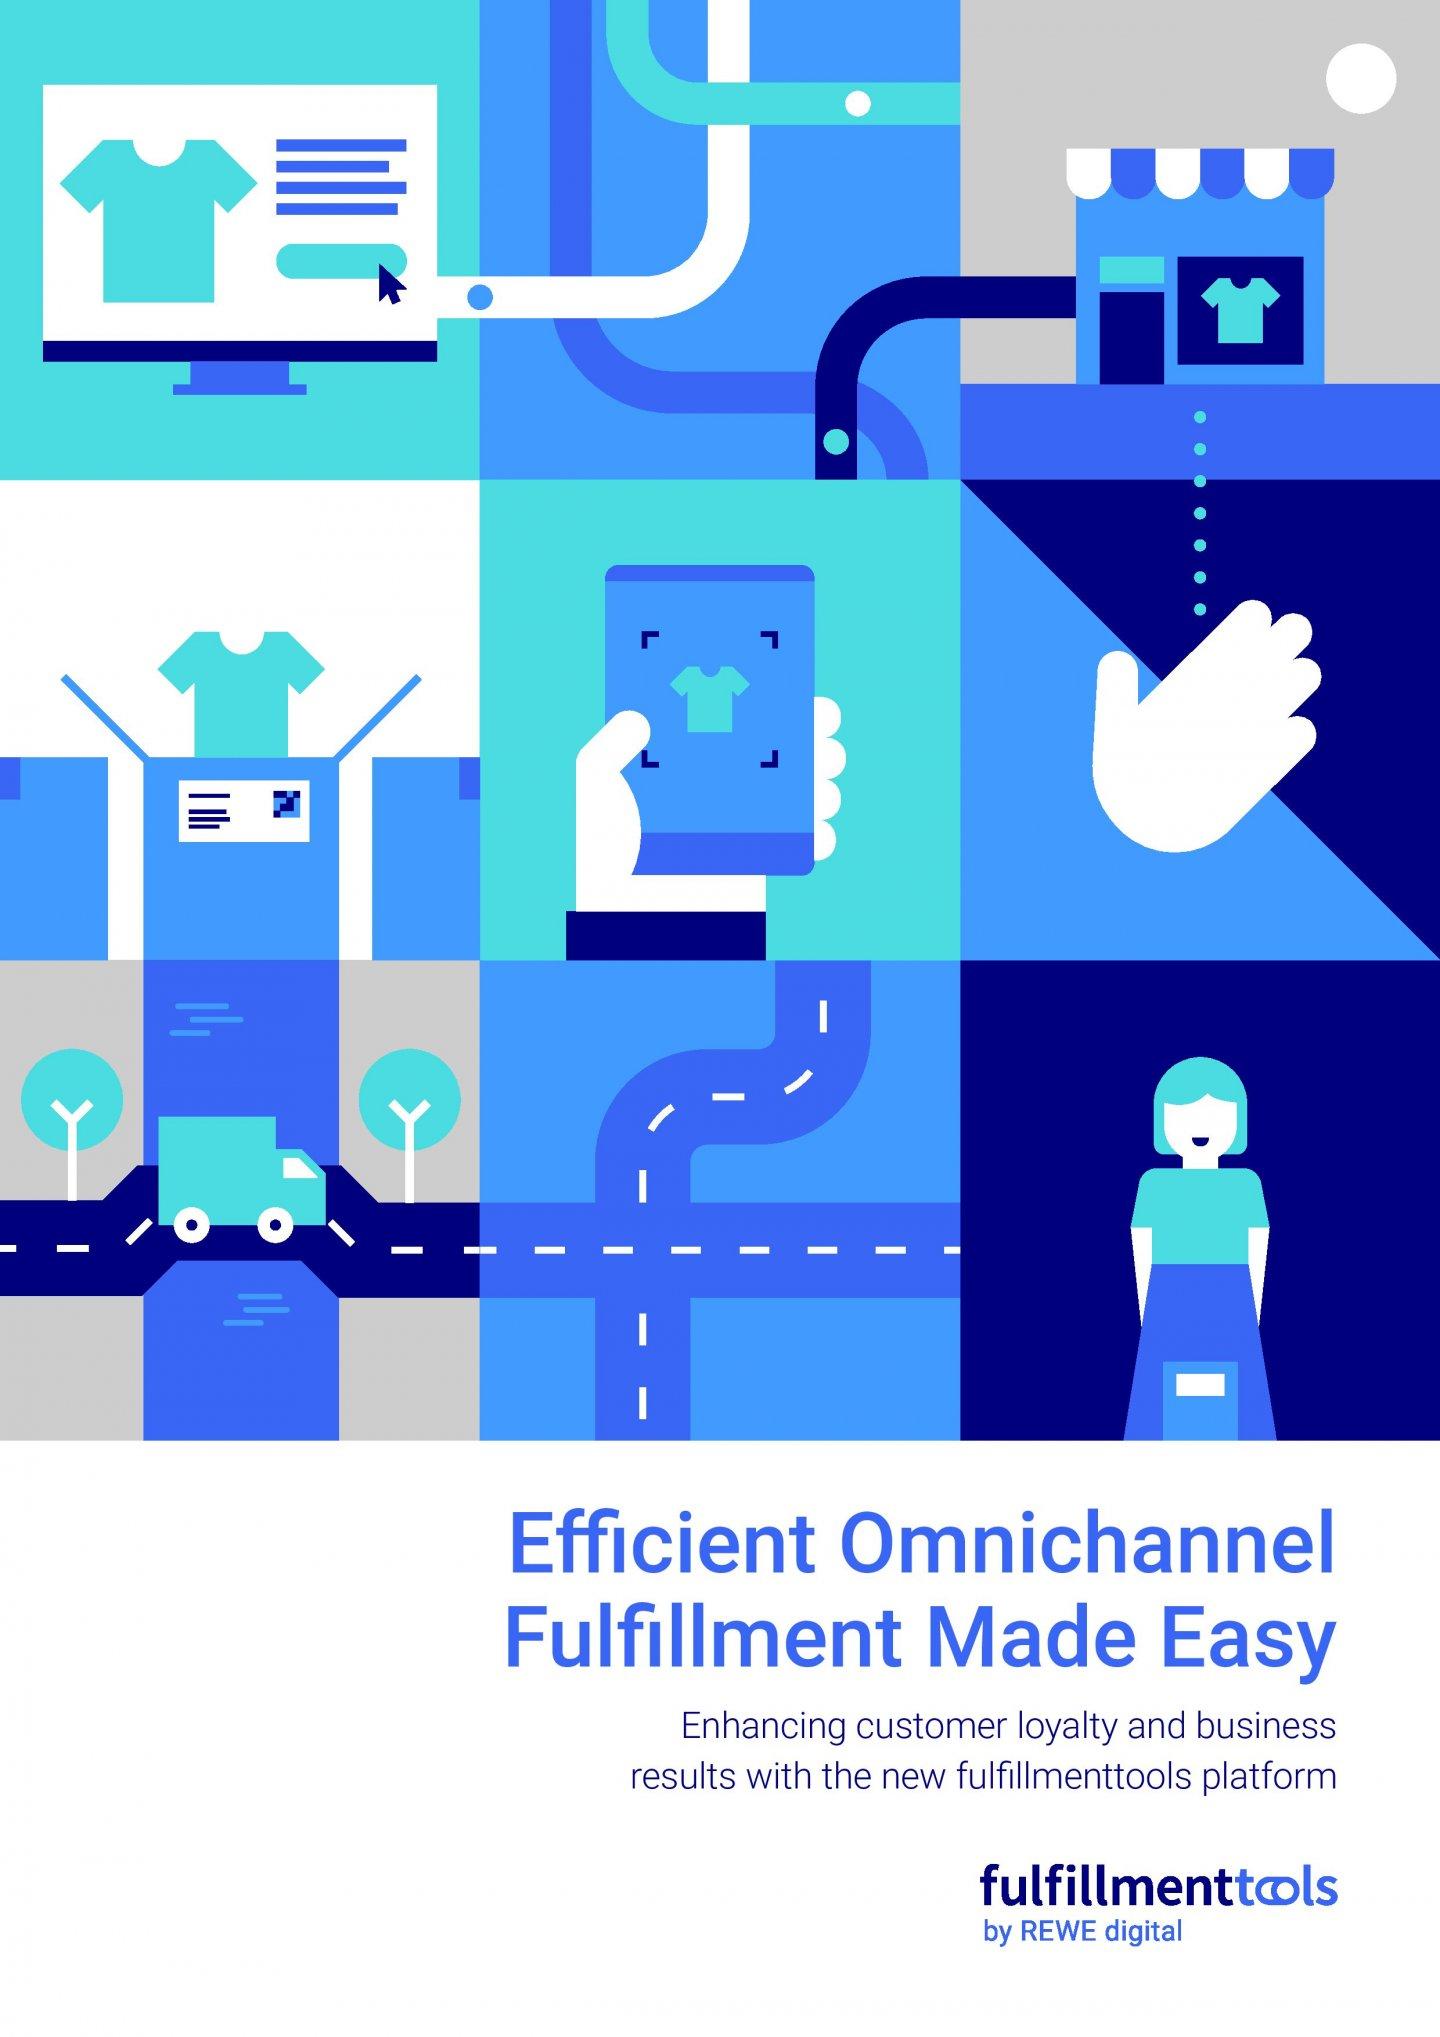 Teaser fulfillmenttools Whitepaper efficient omnichannel fulfillment